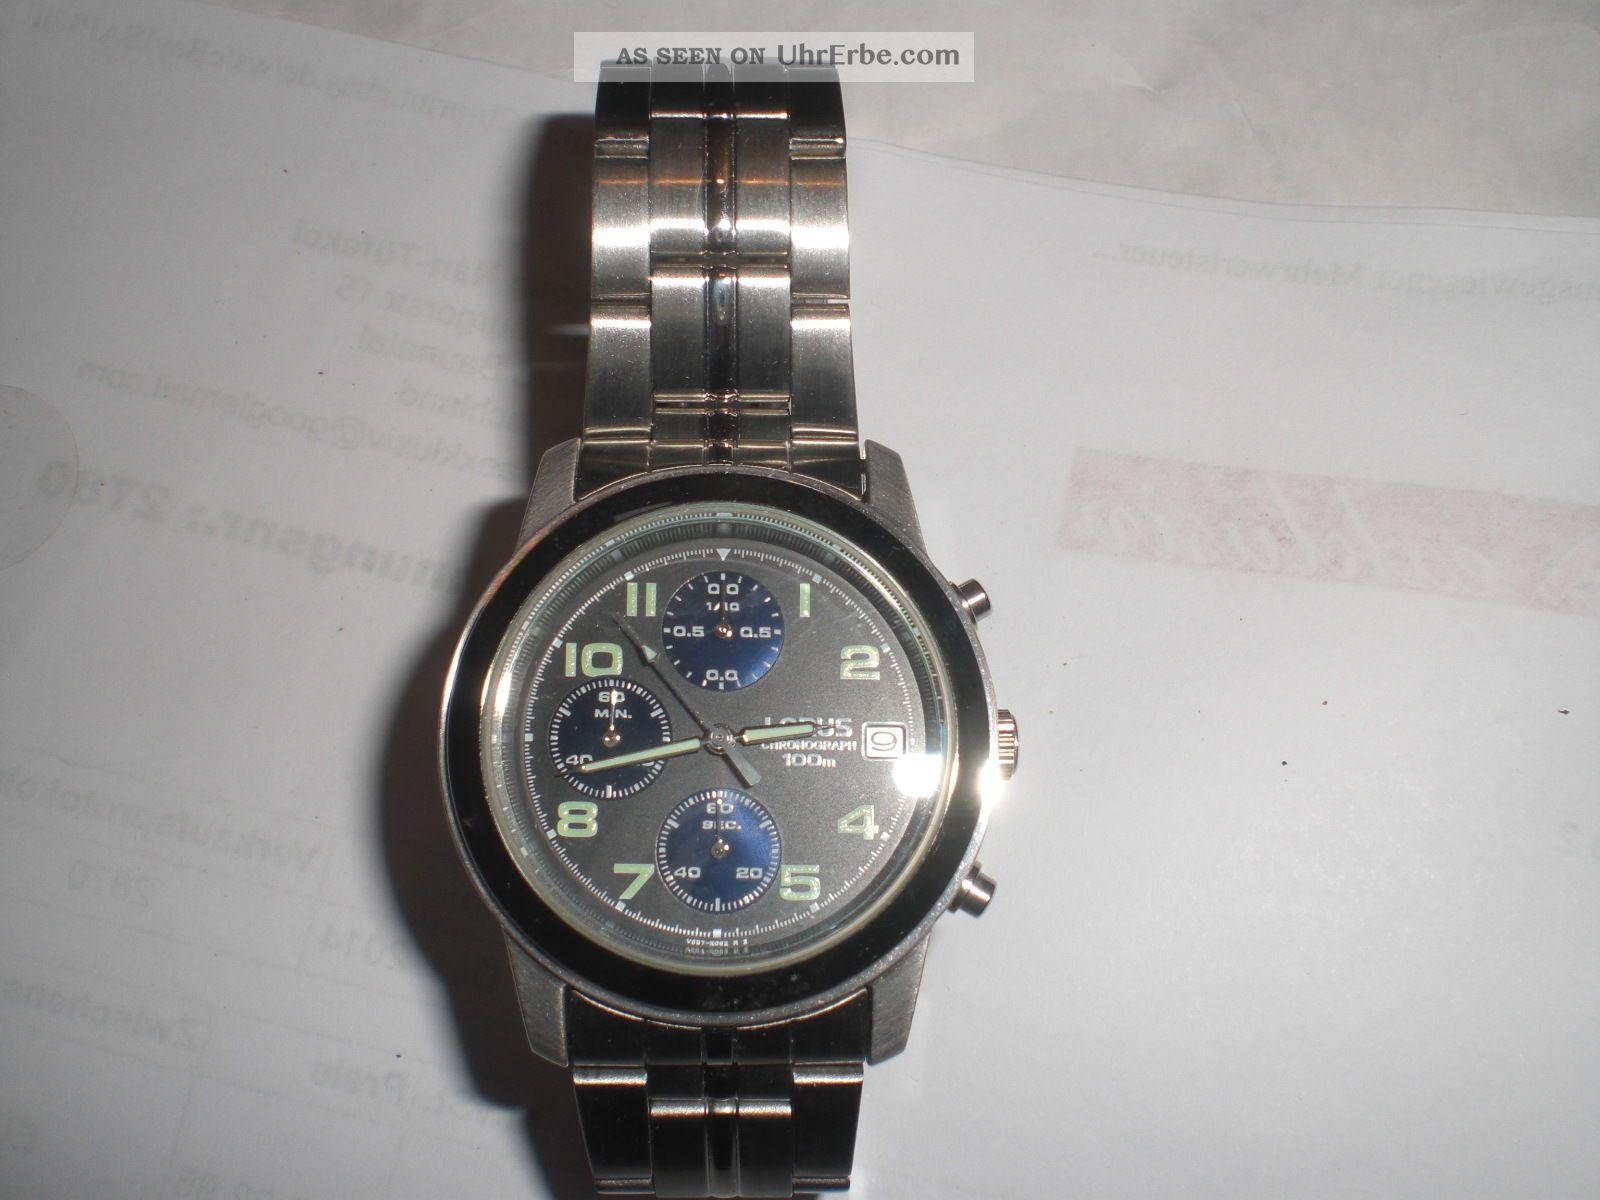 Herrenuhr Von Lorus Chronograph Armbanduhren Bild